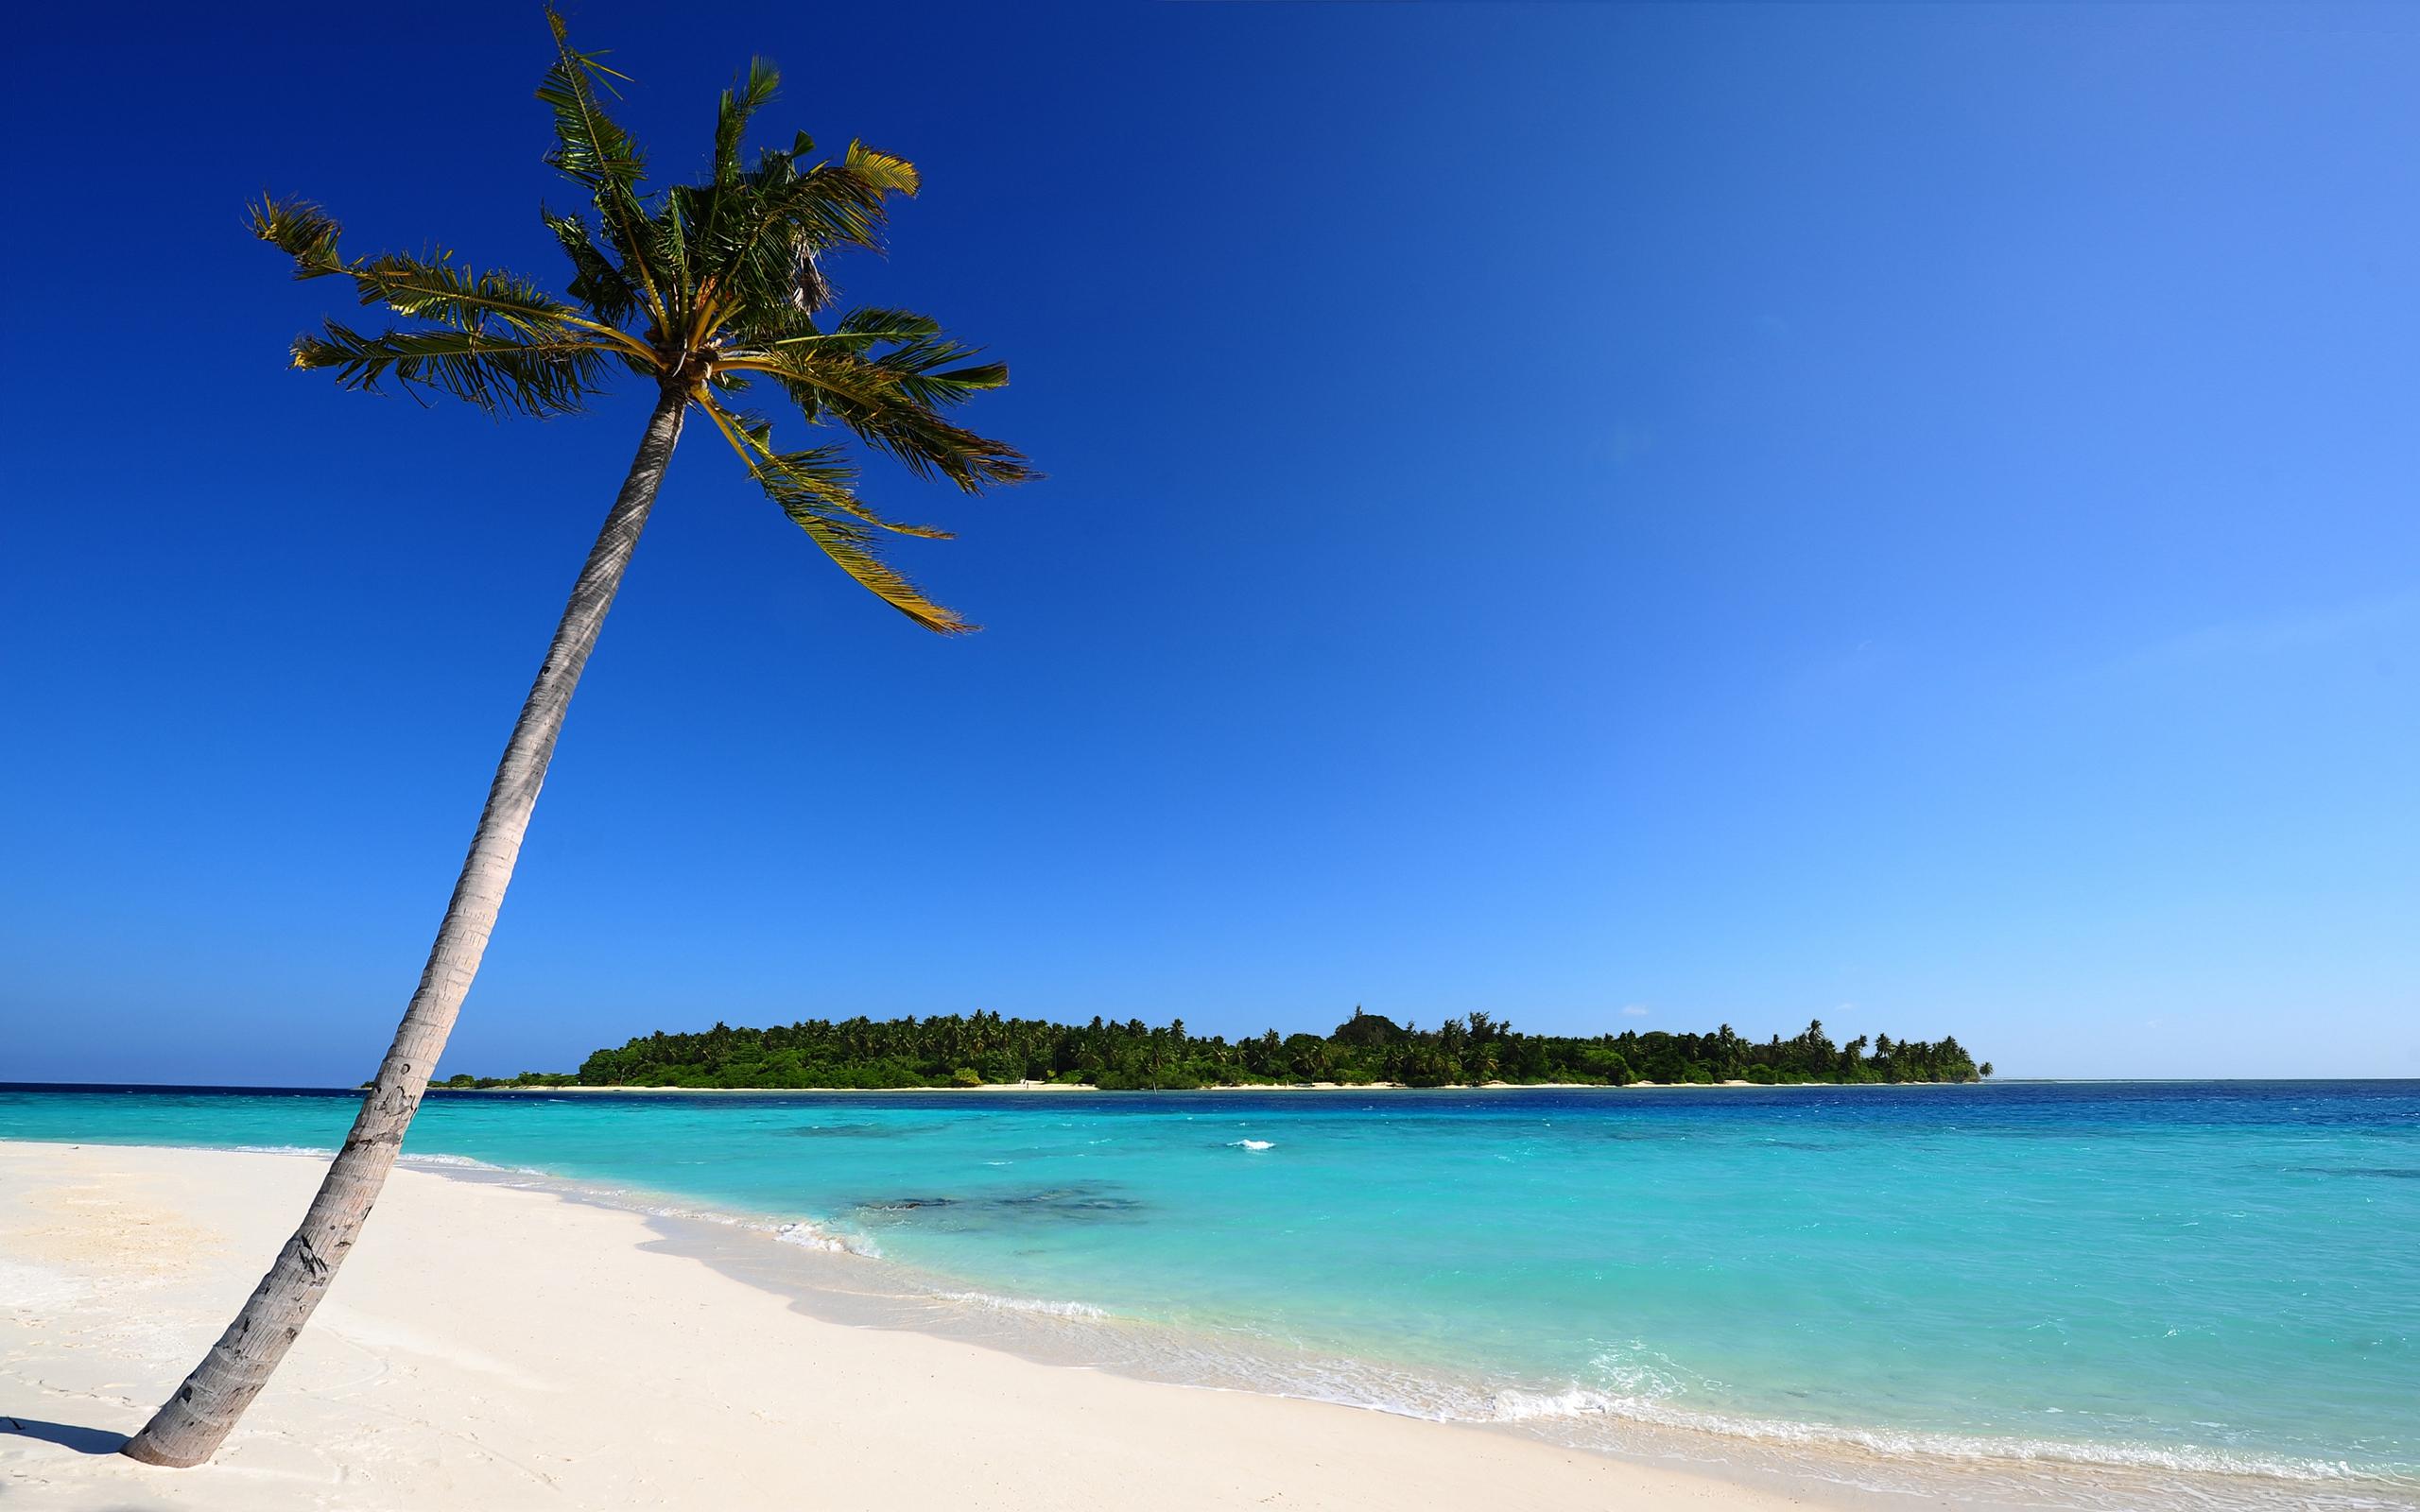 Hd wallpaper beach - Hd Wallpaper Beach Beach Hd Wallpaper In High Resolution For Free Get Maldivian Beach Hd